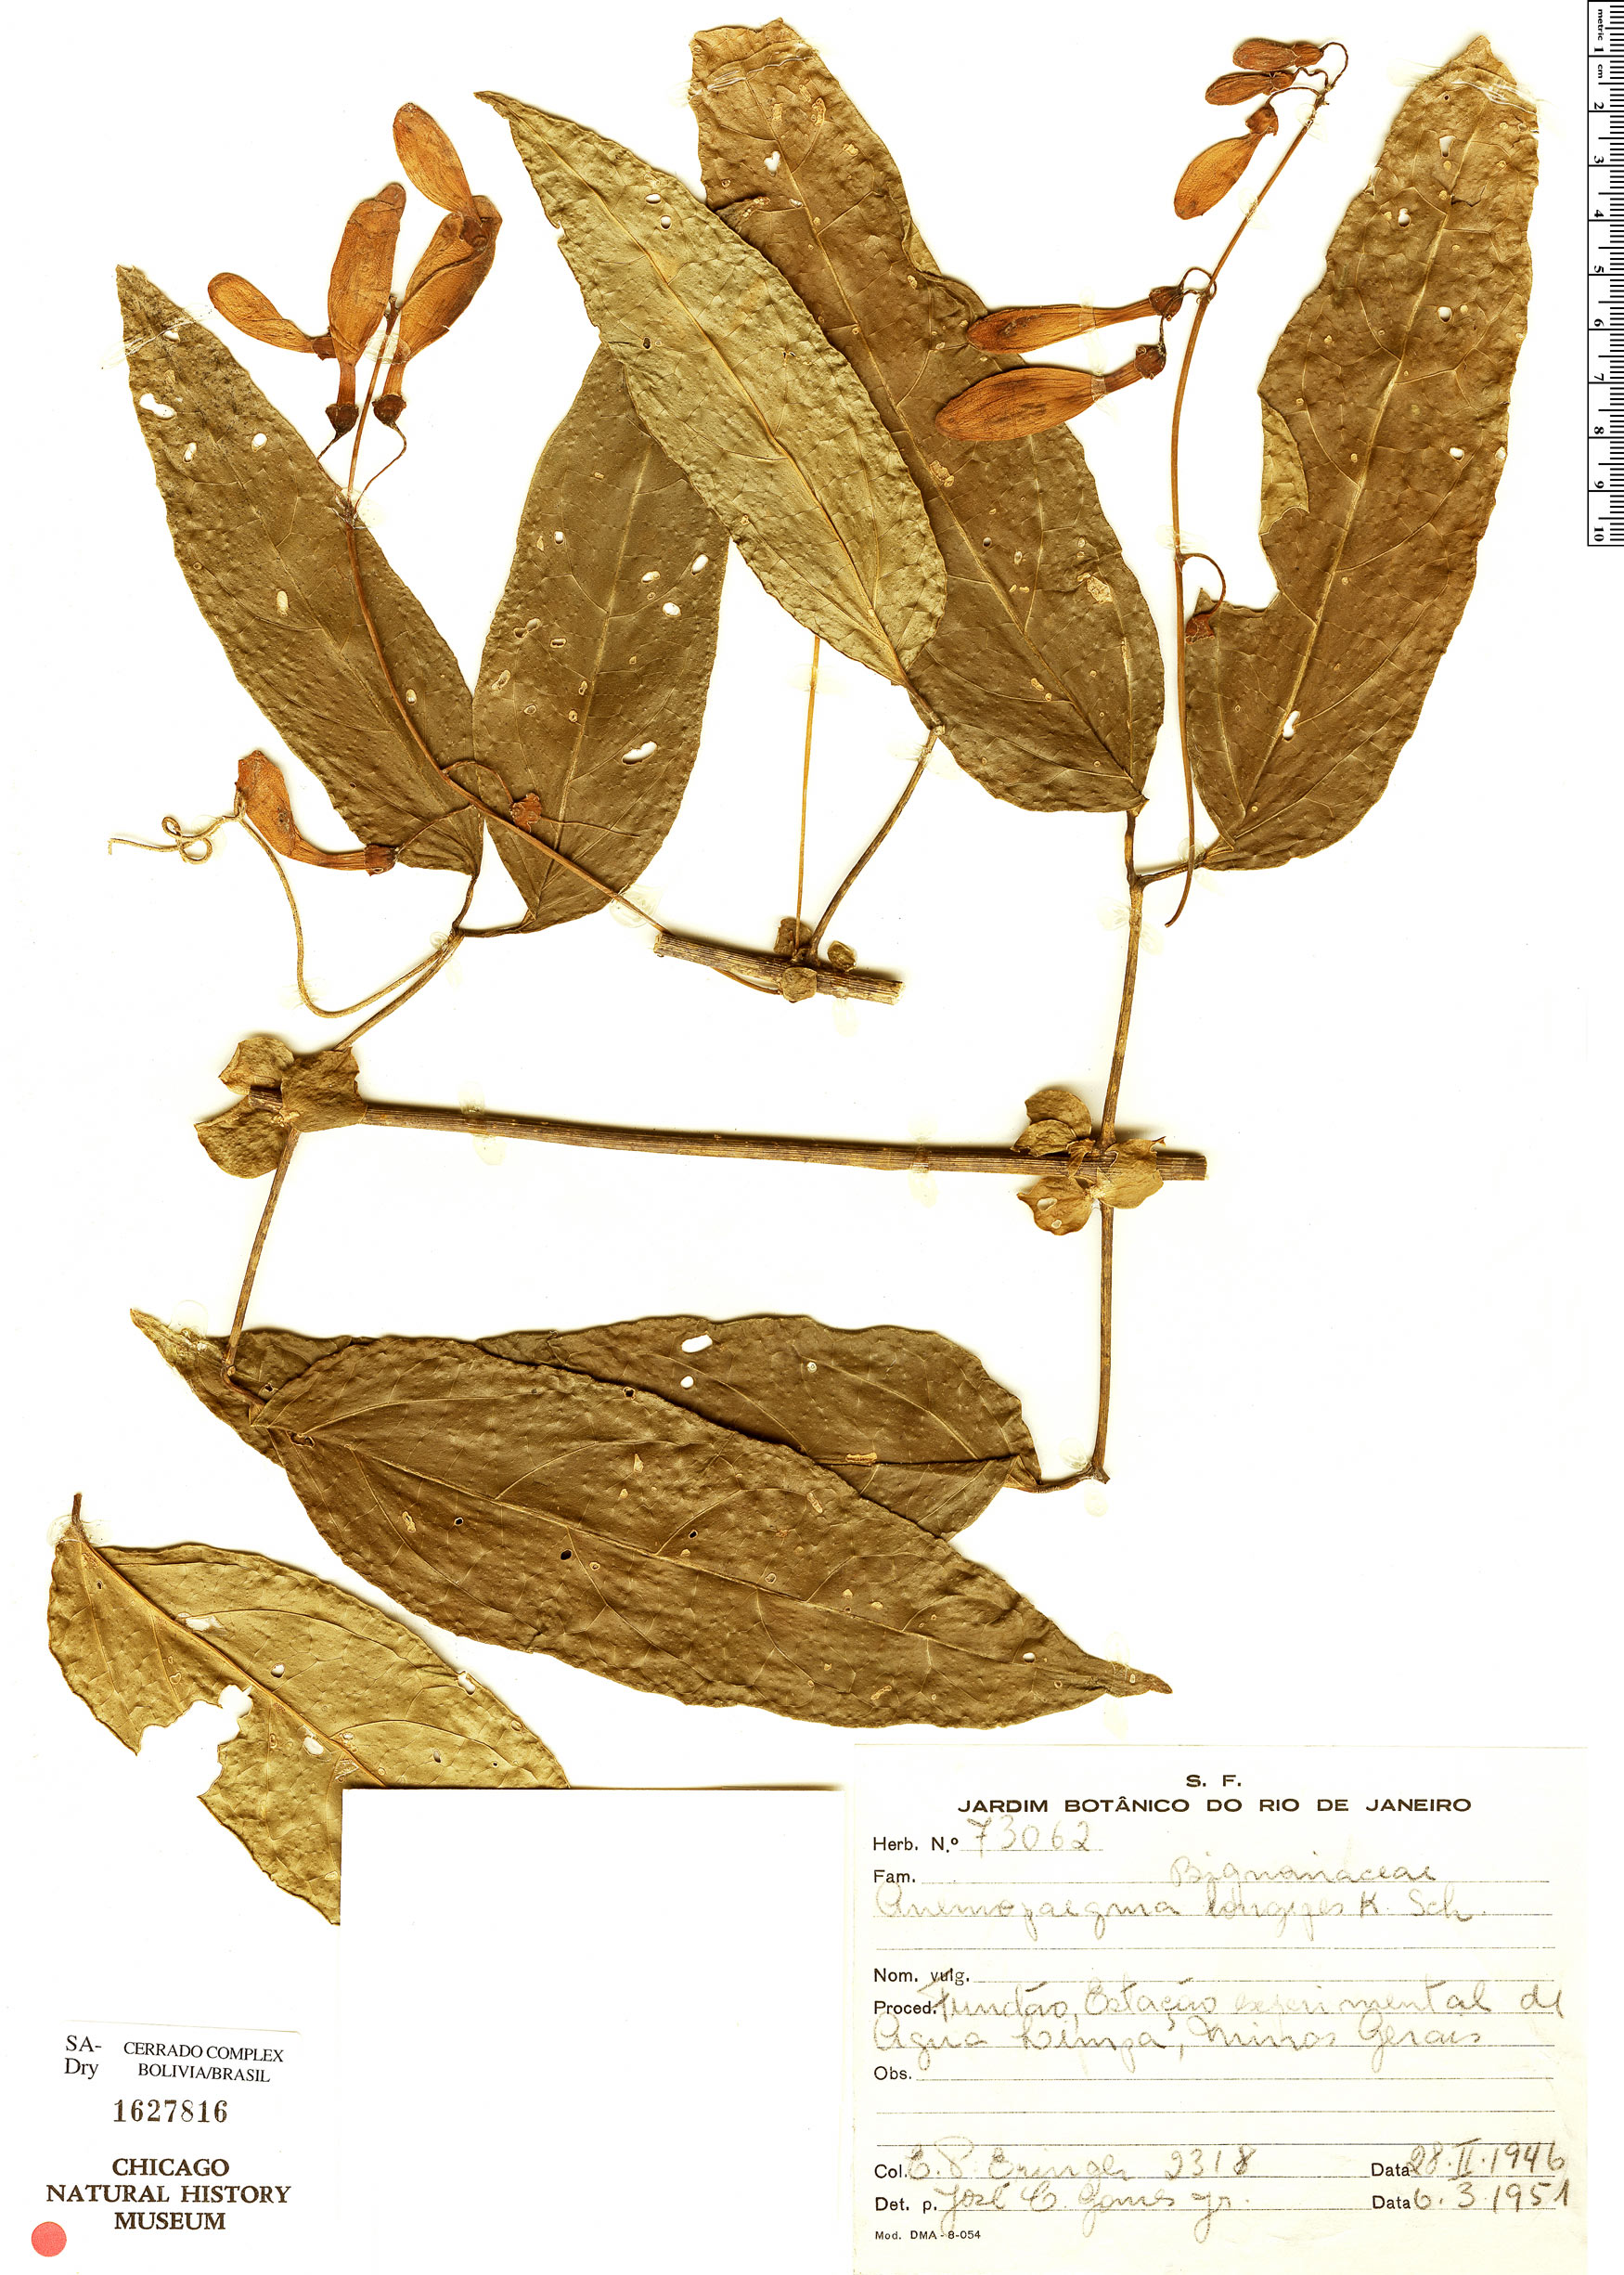 Specimen: Anemopaegma chamberlaynii